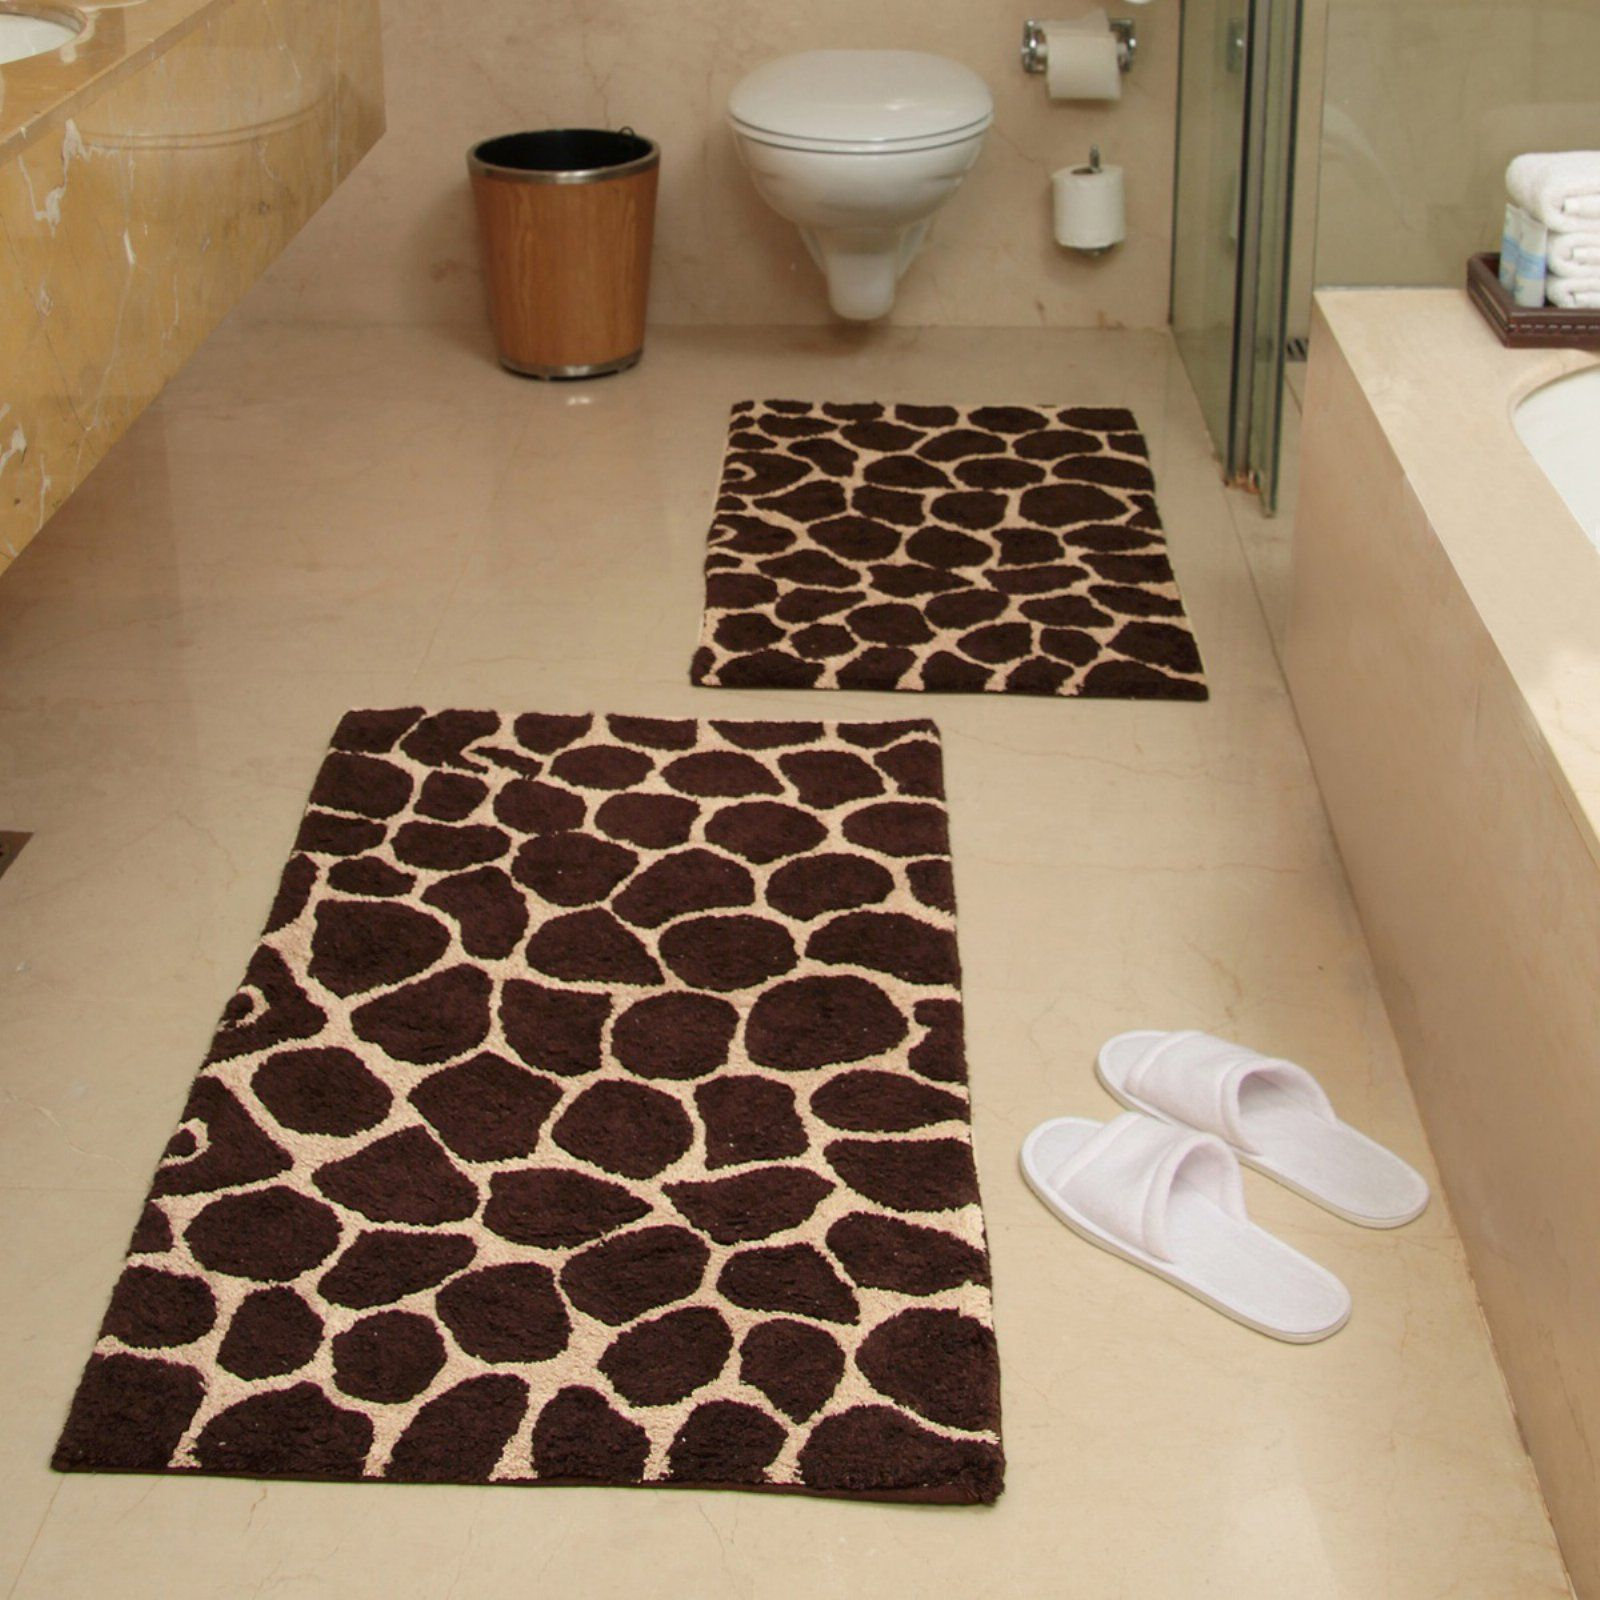 2 Piece Giraffe Bath Rug Set Chocolate And Beige Giraffe Decor Rug Sets Bathroom Rug Sets [ 1600 x 1600 Pixel ]